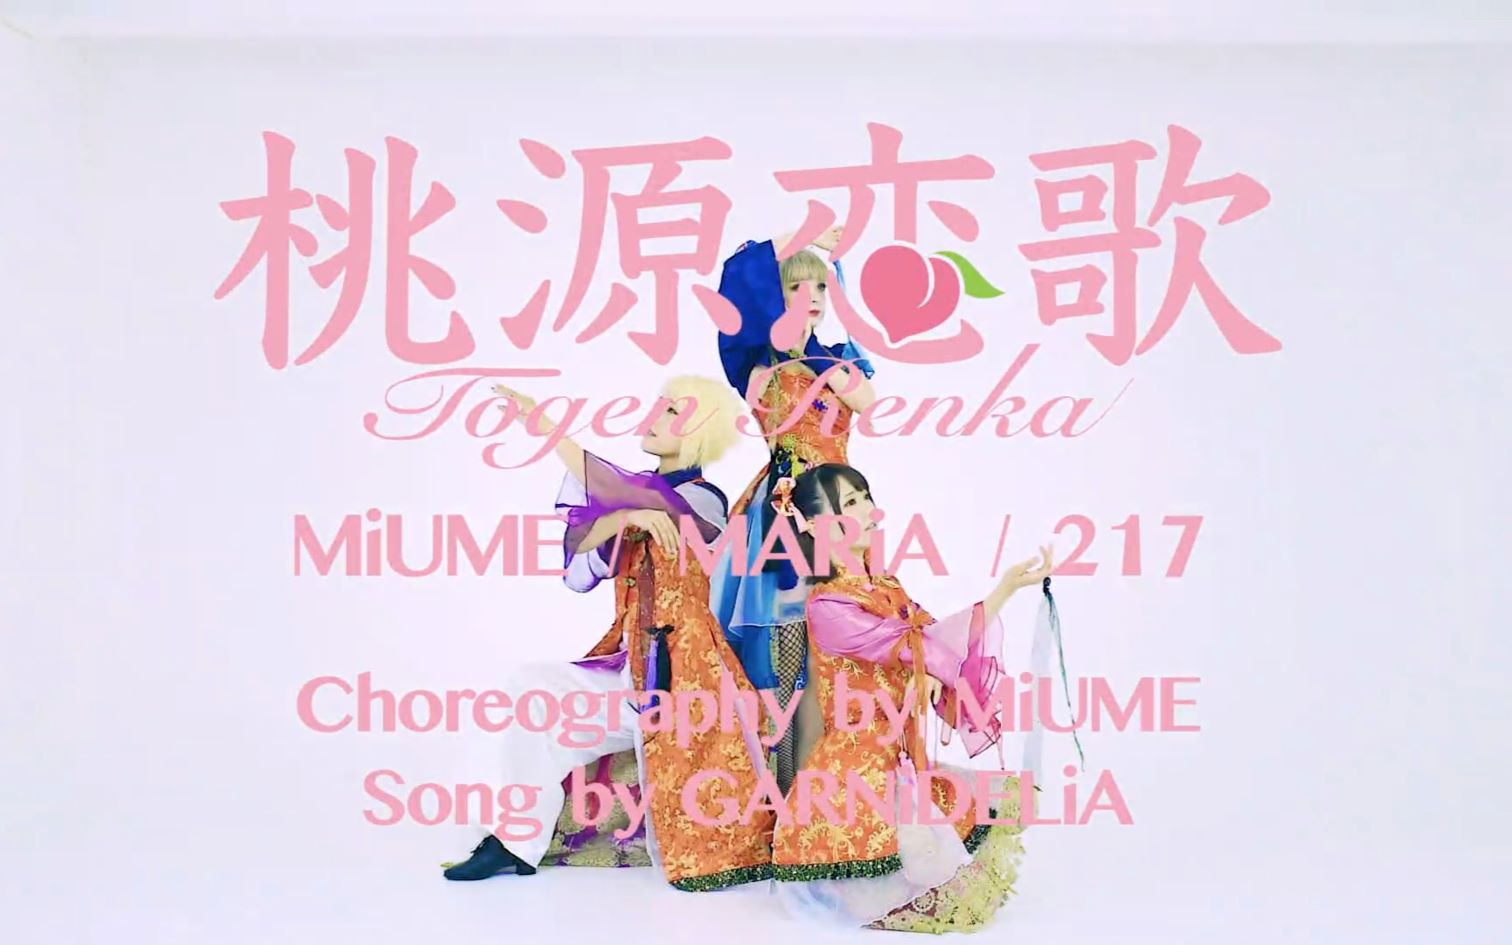 【Miume・MARiA・217】桃源恋歌【舞见 第5弹!!!】